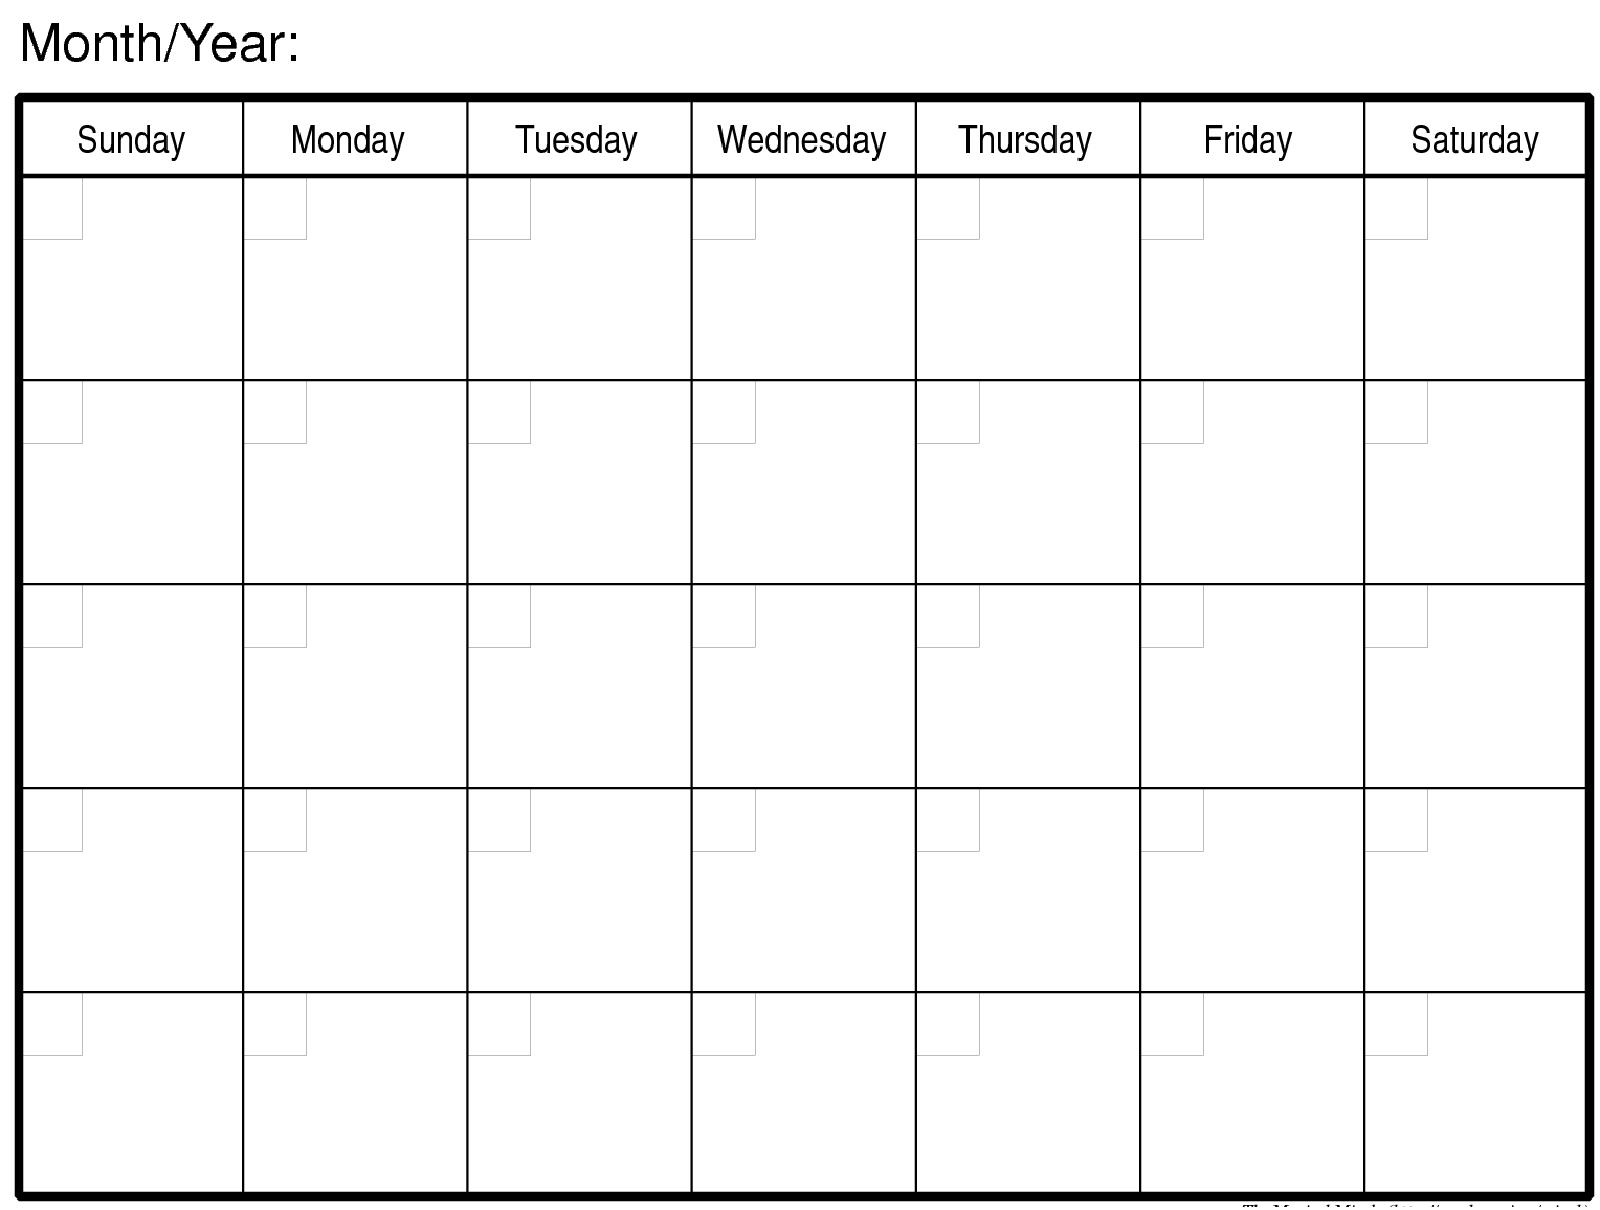 Generous Blank Monthly Calendar Templates Gallery Example Resume 89uj